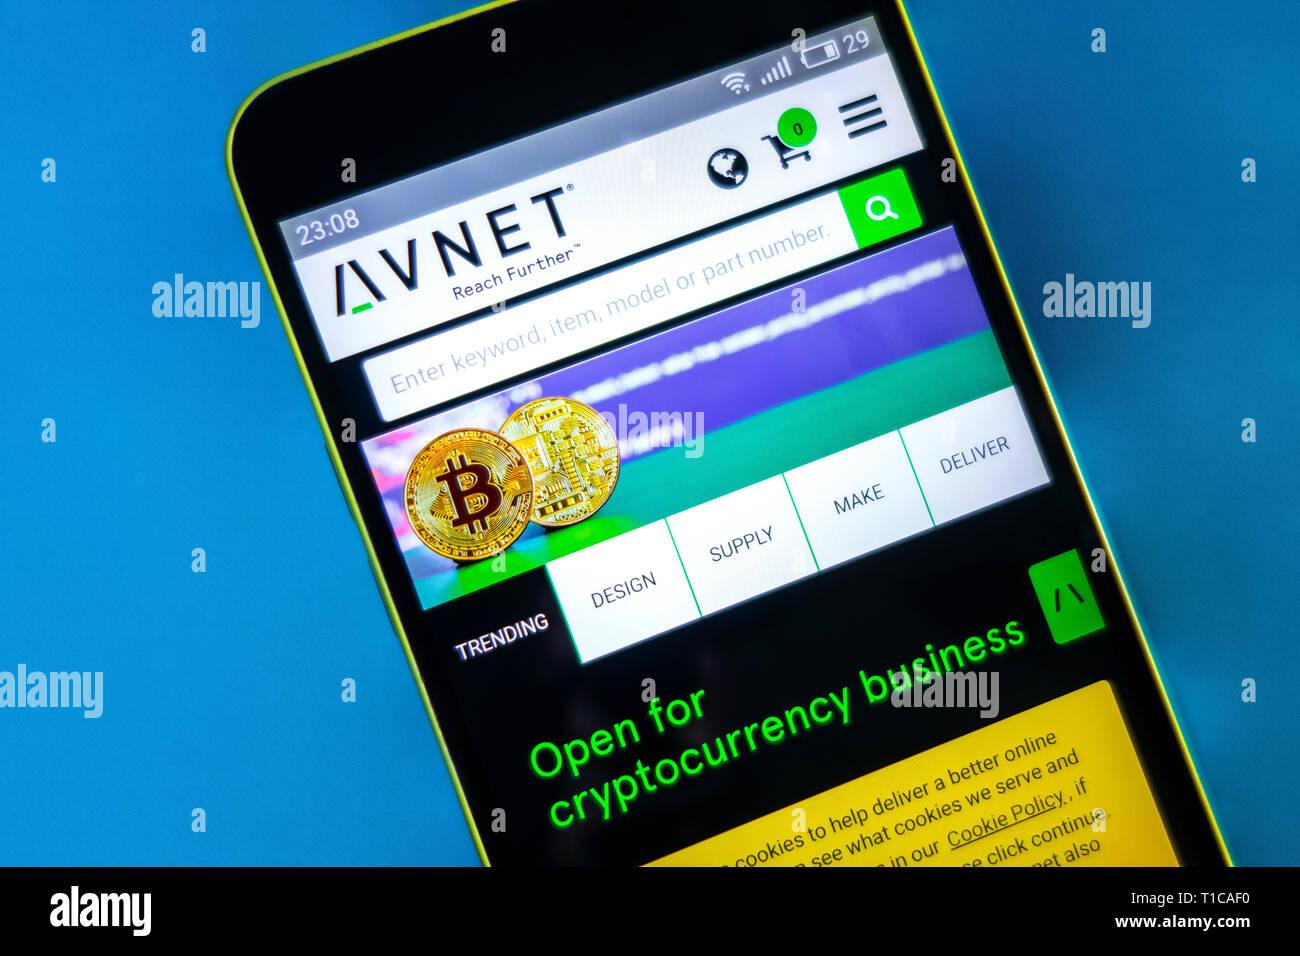 Berdyansk, Ukraine - März 23, 2019: Illustrative Editorial, Avnet Website Homepage. Avnet Logo sichtbar auf dem Bildschirm des Telefons. Stockbild